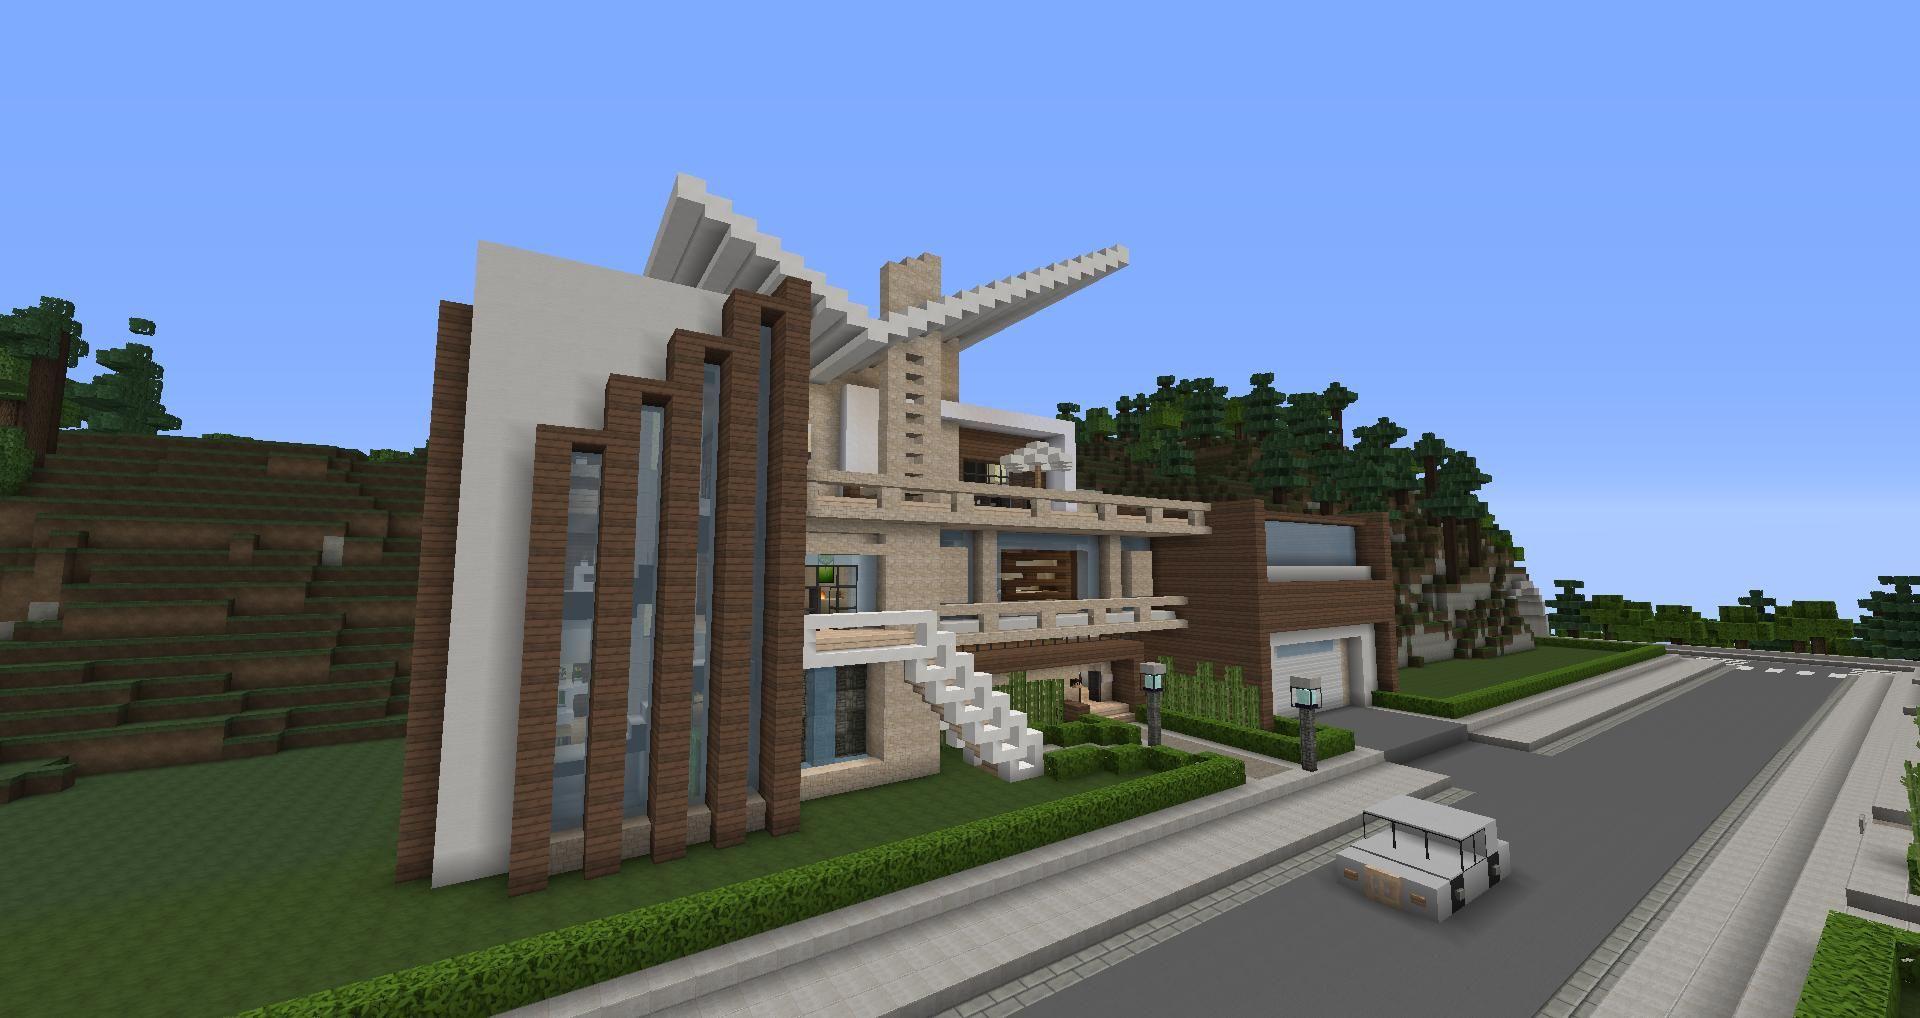 Minecraft strutture bellissime cerca con google for Case bellissime minecraft